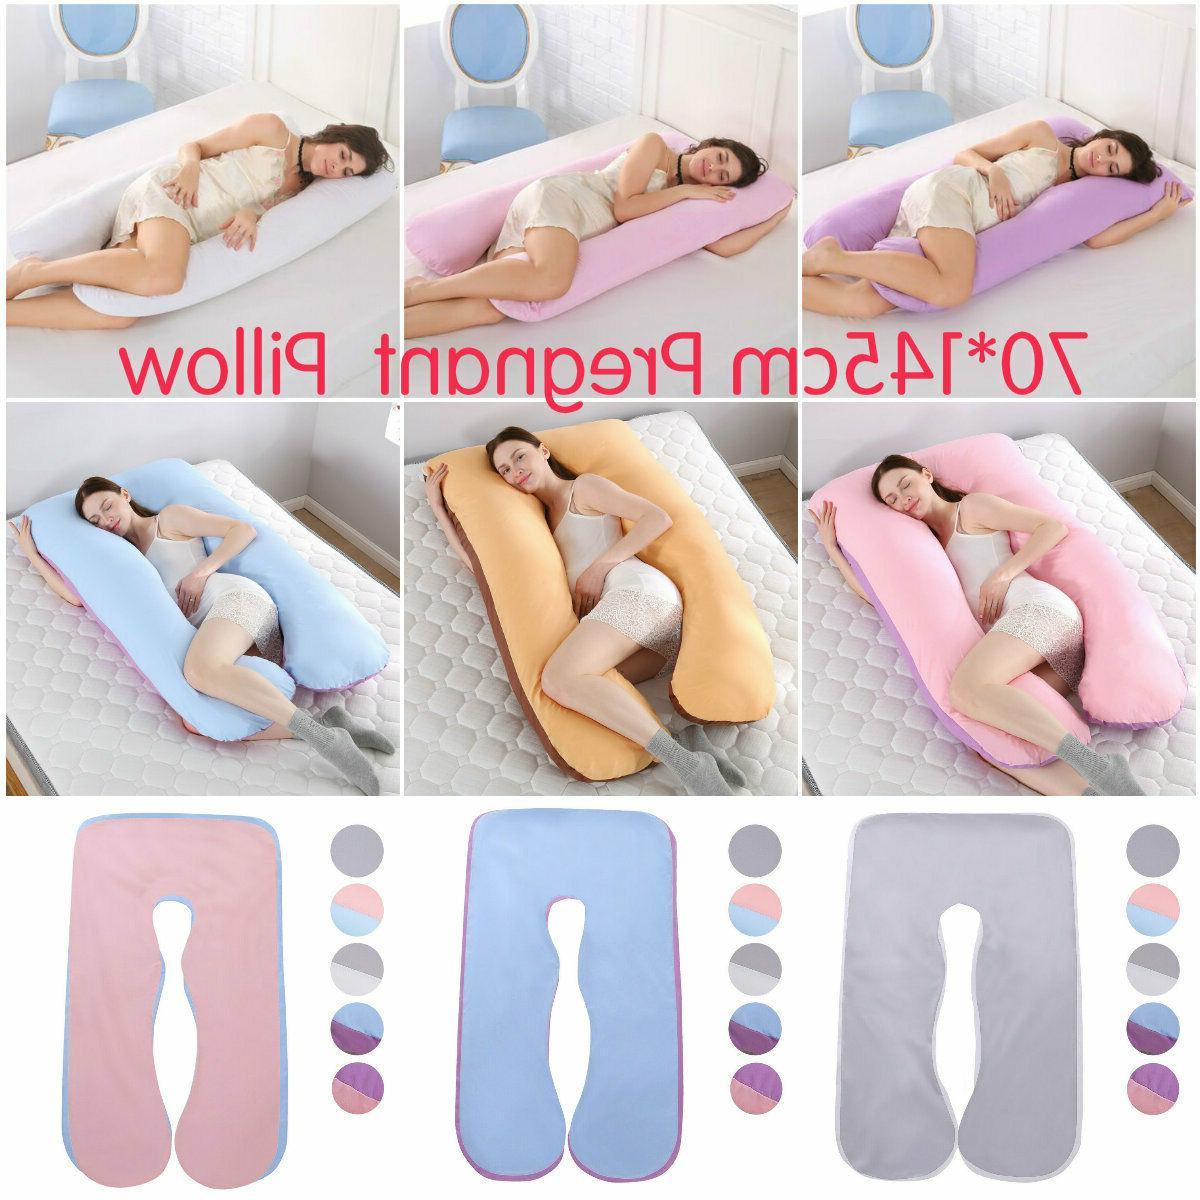 u shape pregnancy pillow full body pillow